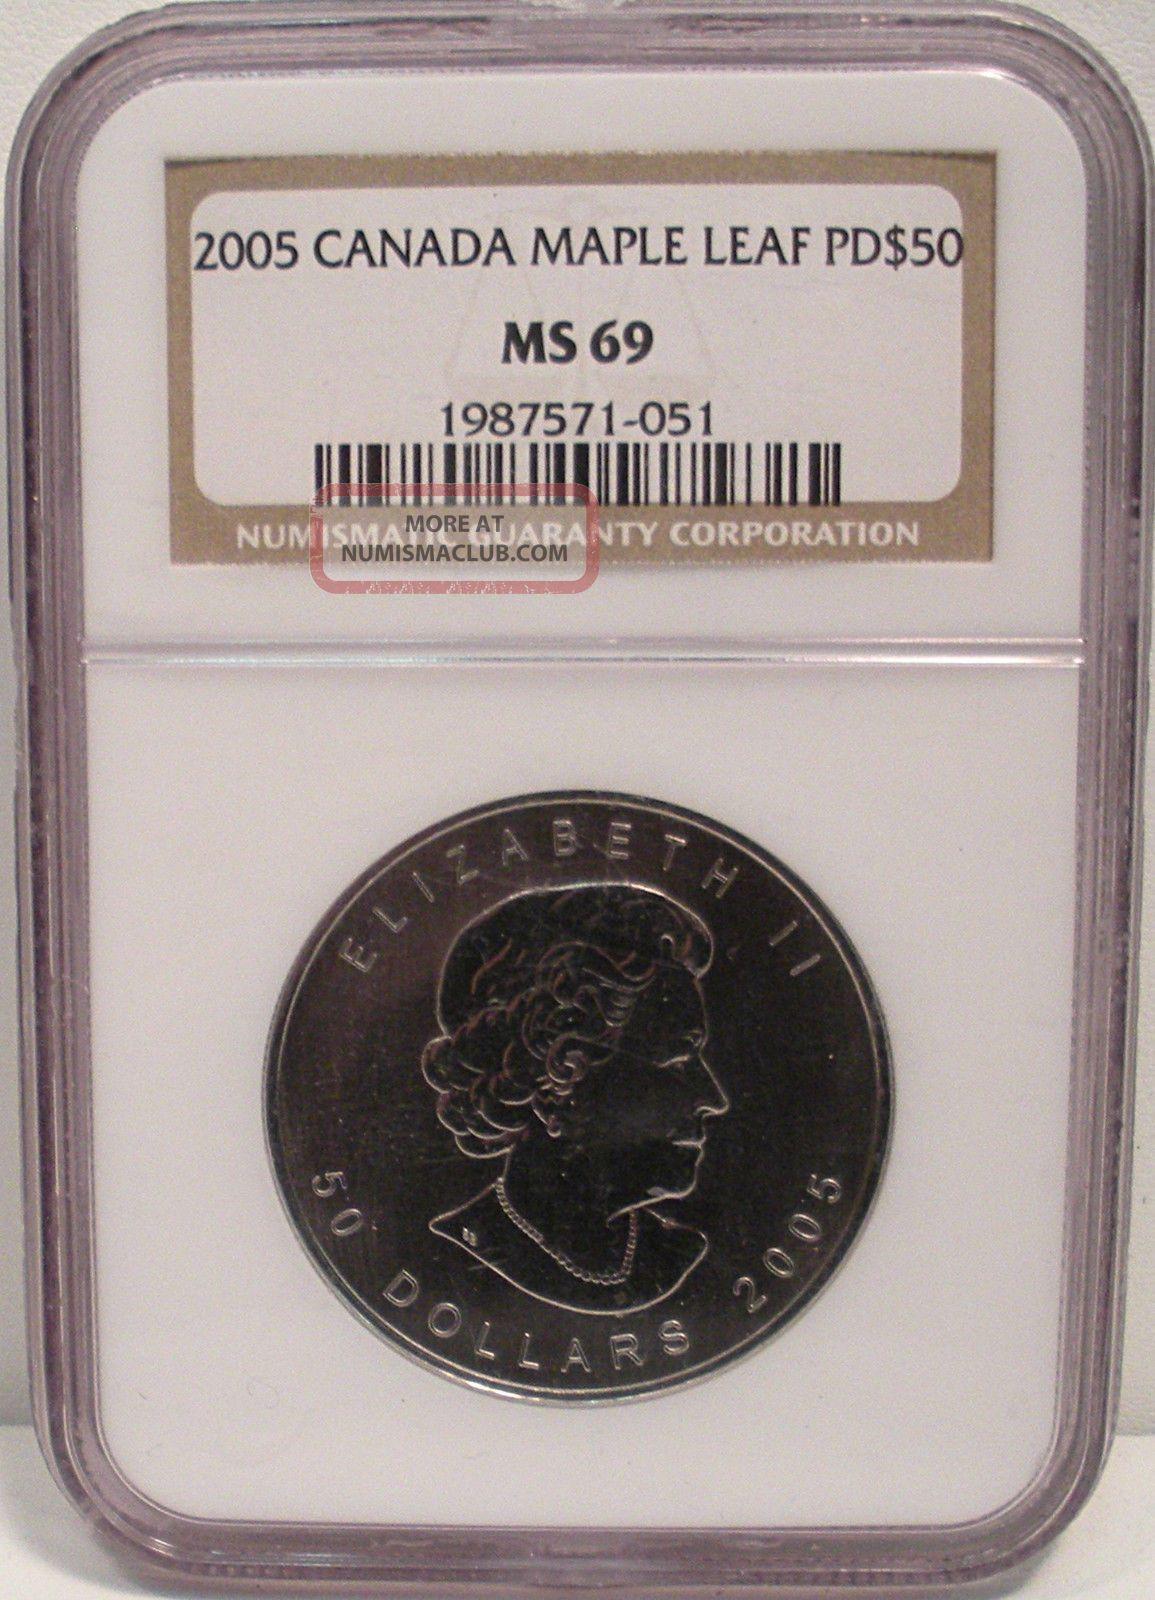 2005 1oz Palladium Canadian $50 Maple Leaf Ngc Ms69 Coin From Canada Bullion photo